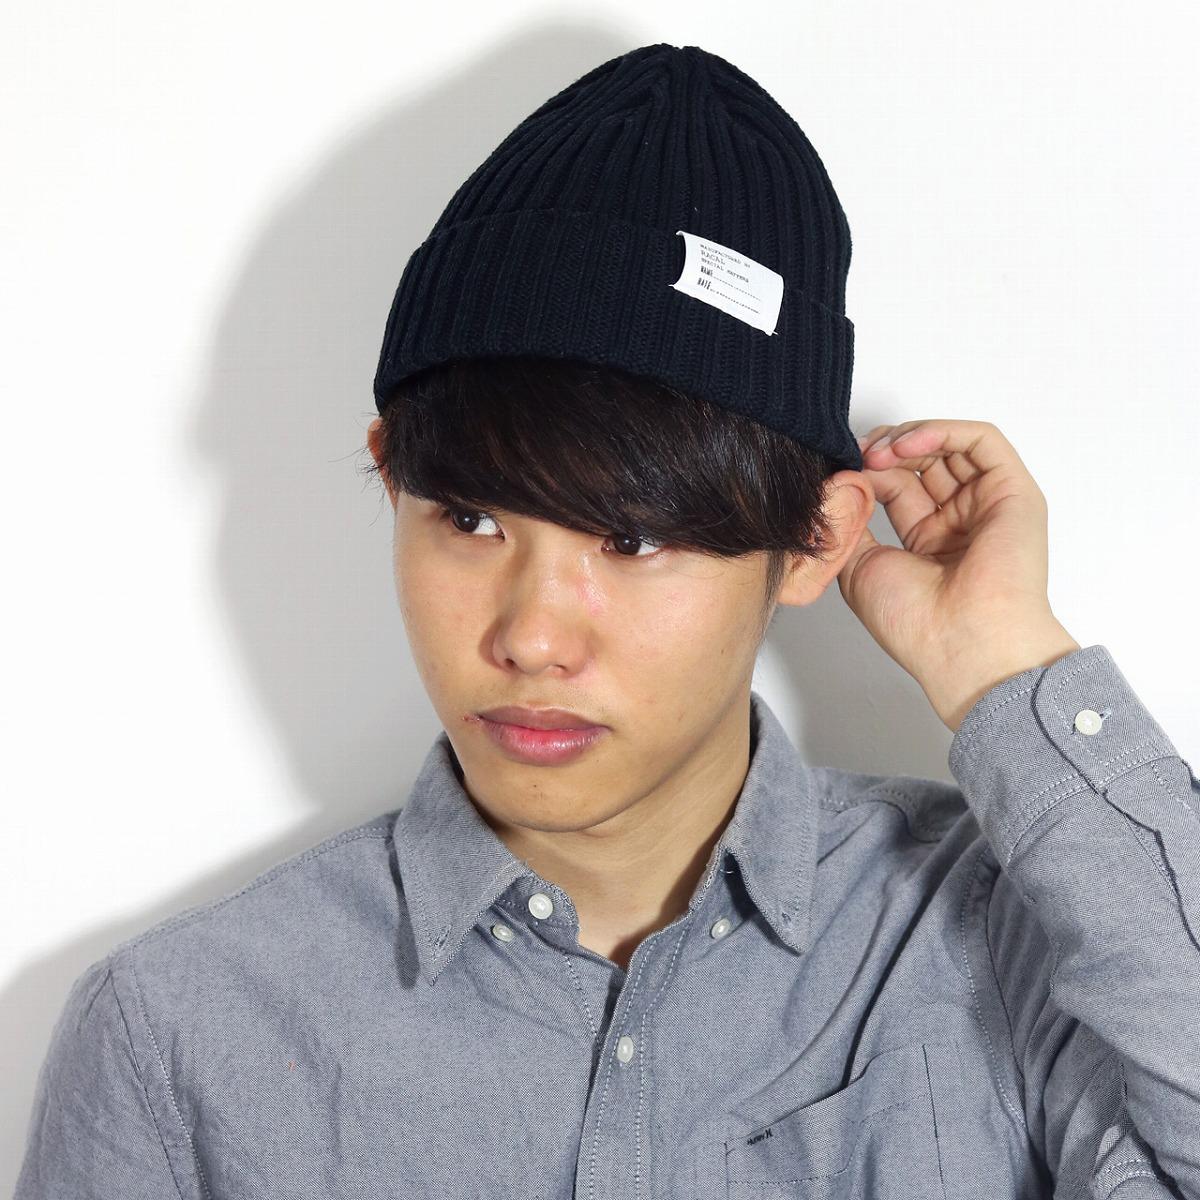 4e99718bb95 ELEHELM HAT STORE  Product made in rib knit hat Lady s knit cap Japan racal  ニットワッチフリーサイズユニセックスサマーニット hat   black black  beanie cap  ...